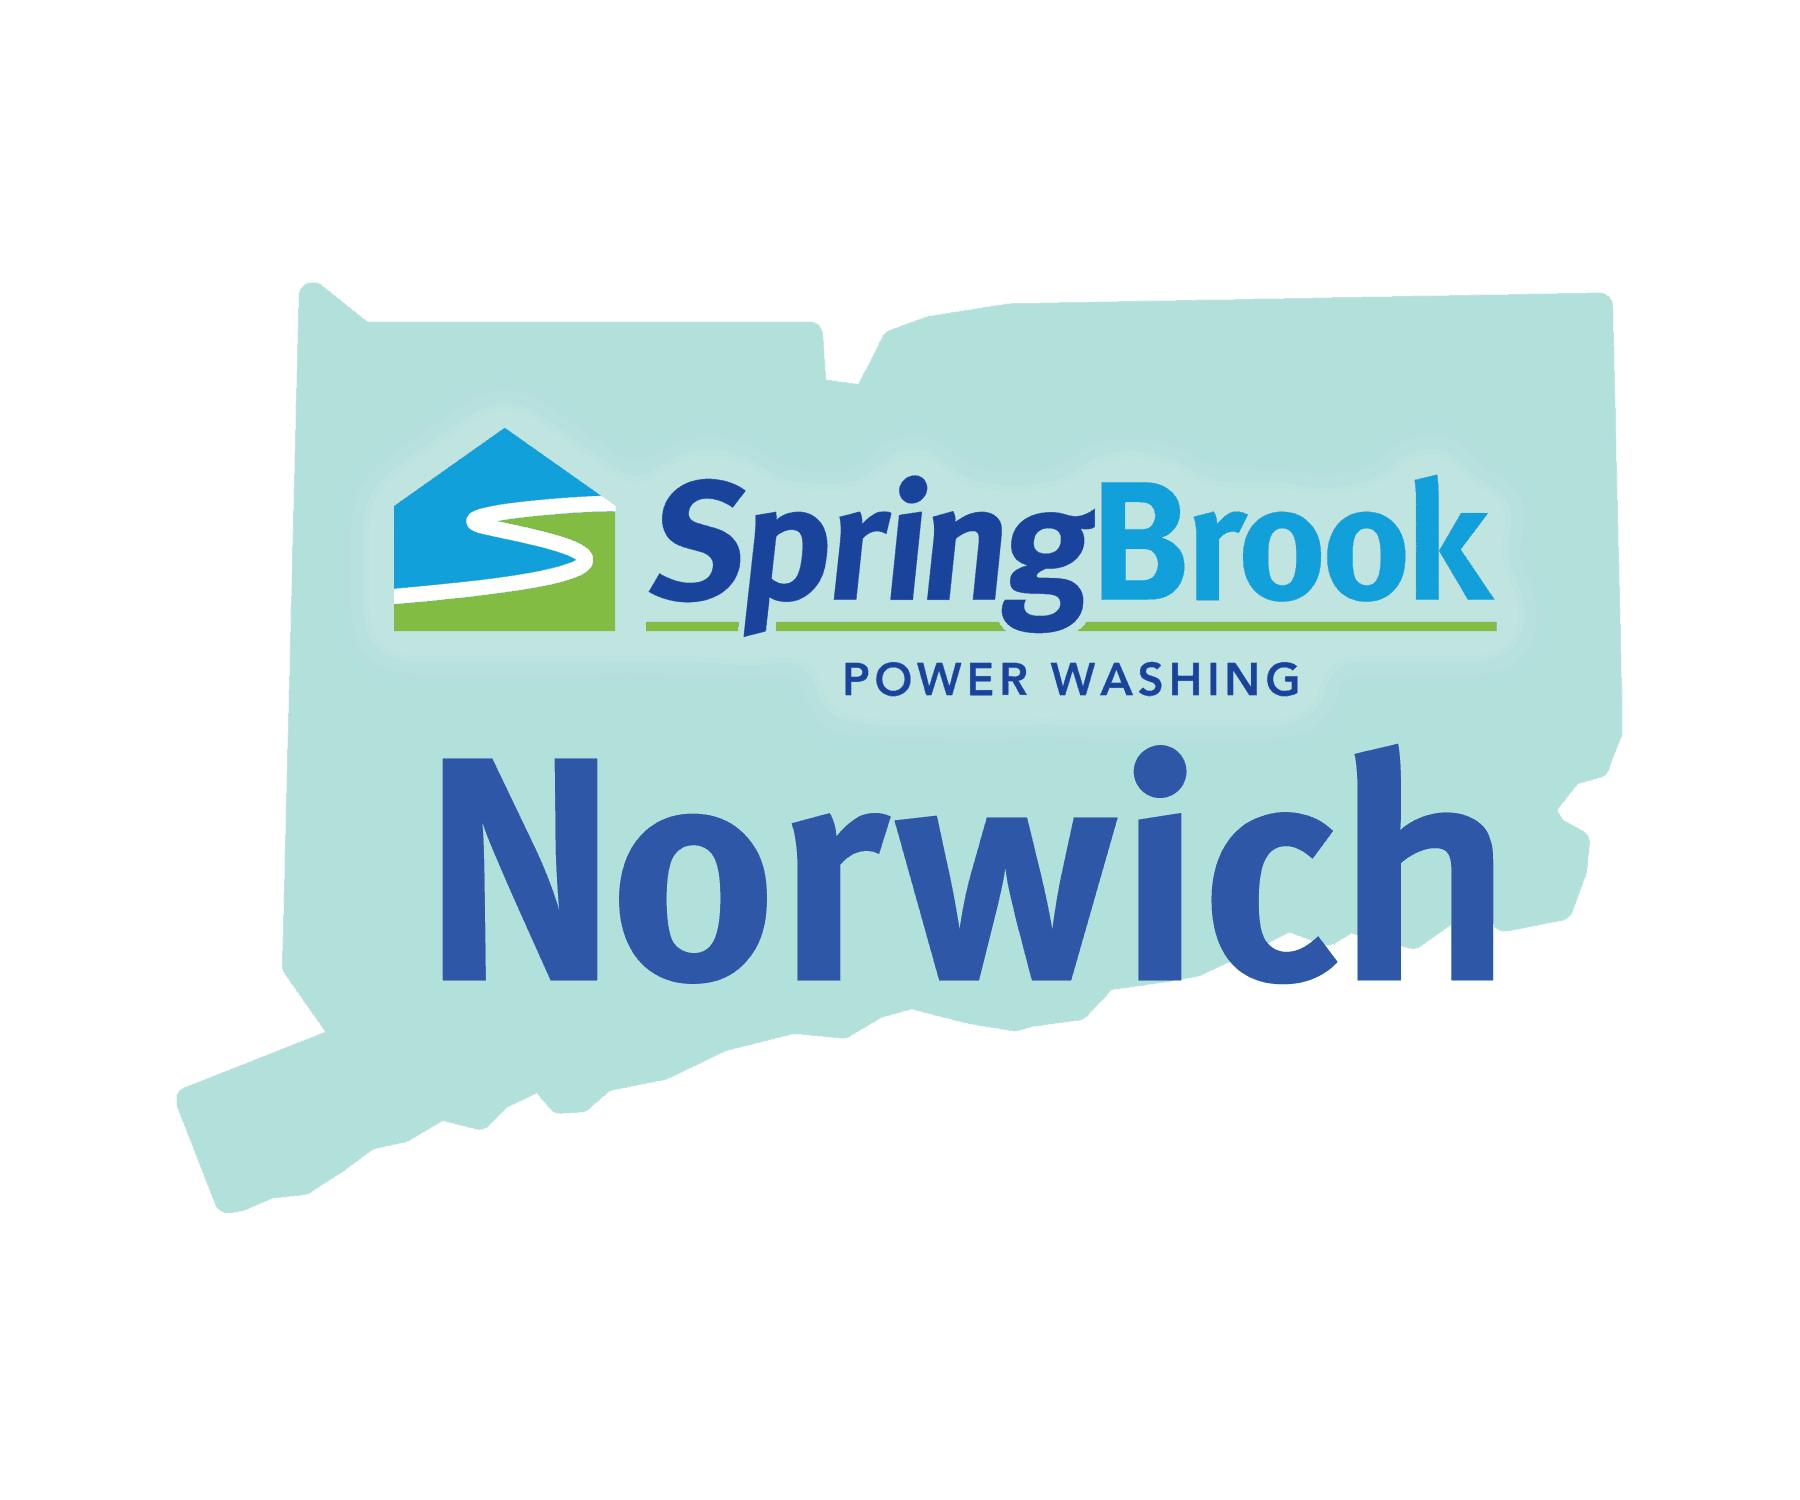 Springbrook Power Washing Norwich Connecticut